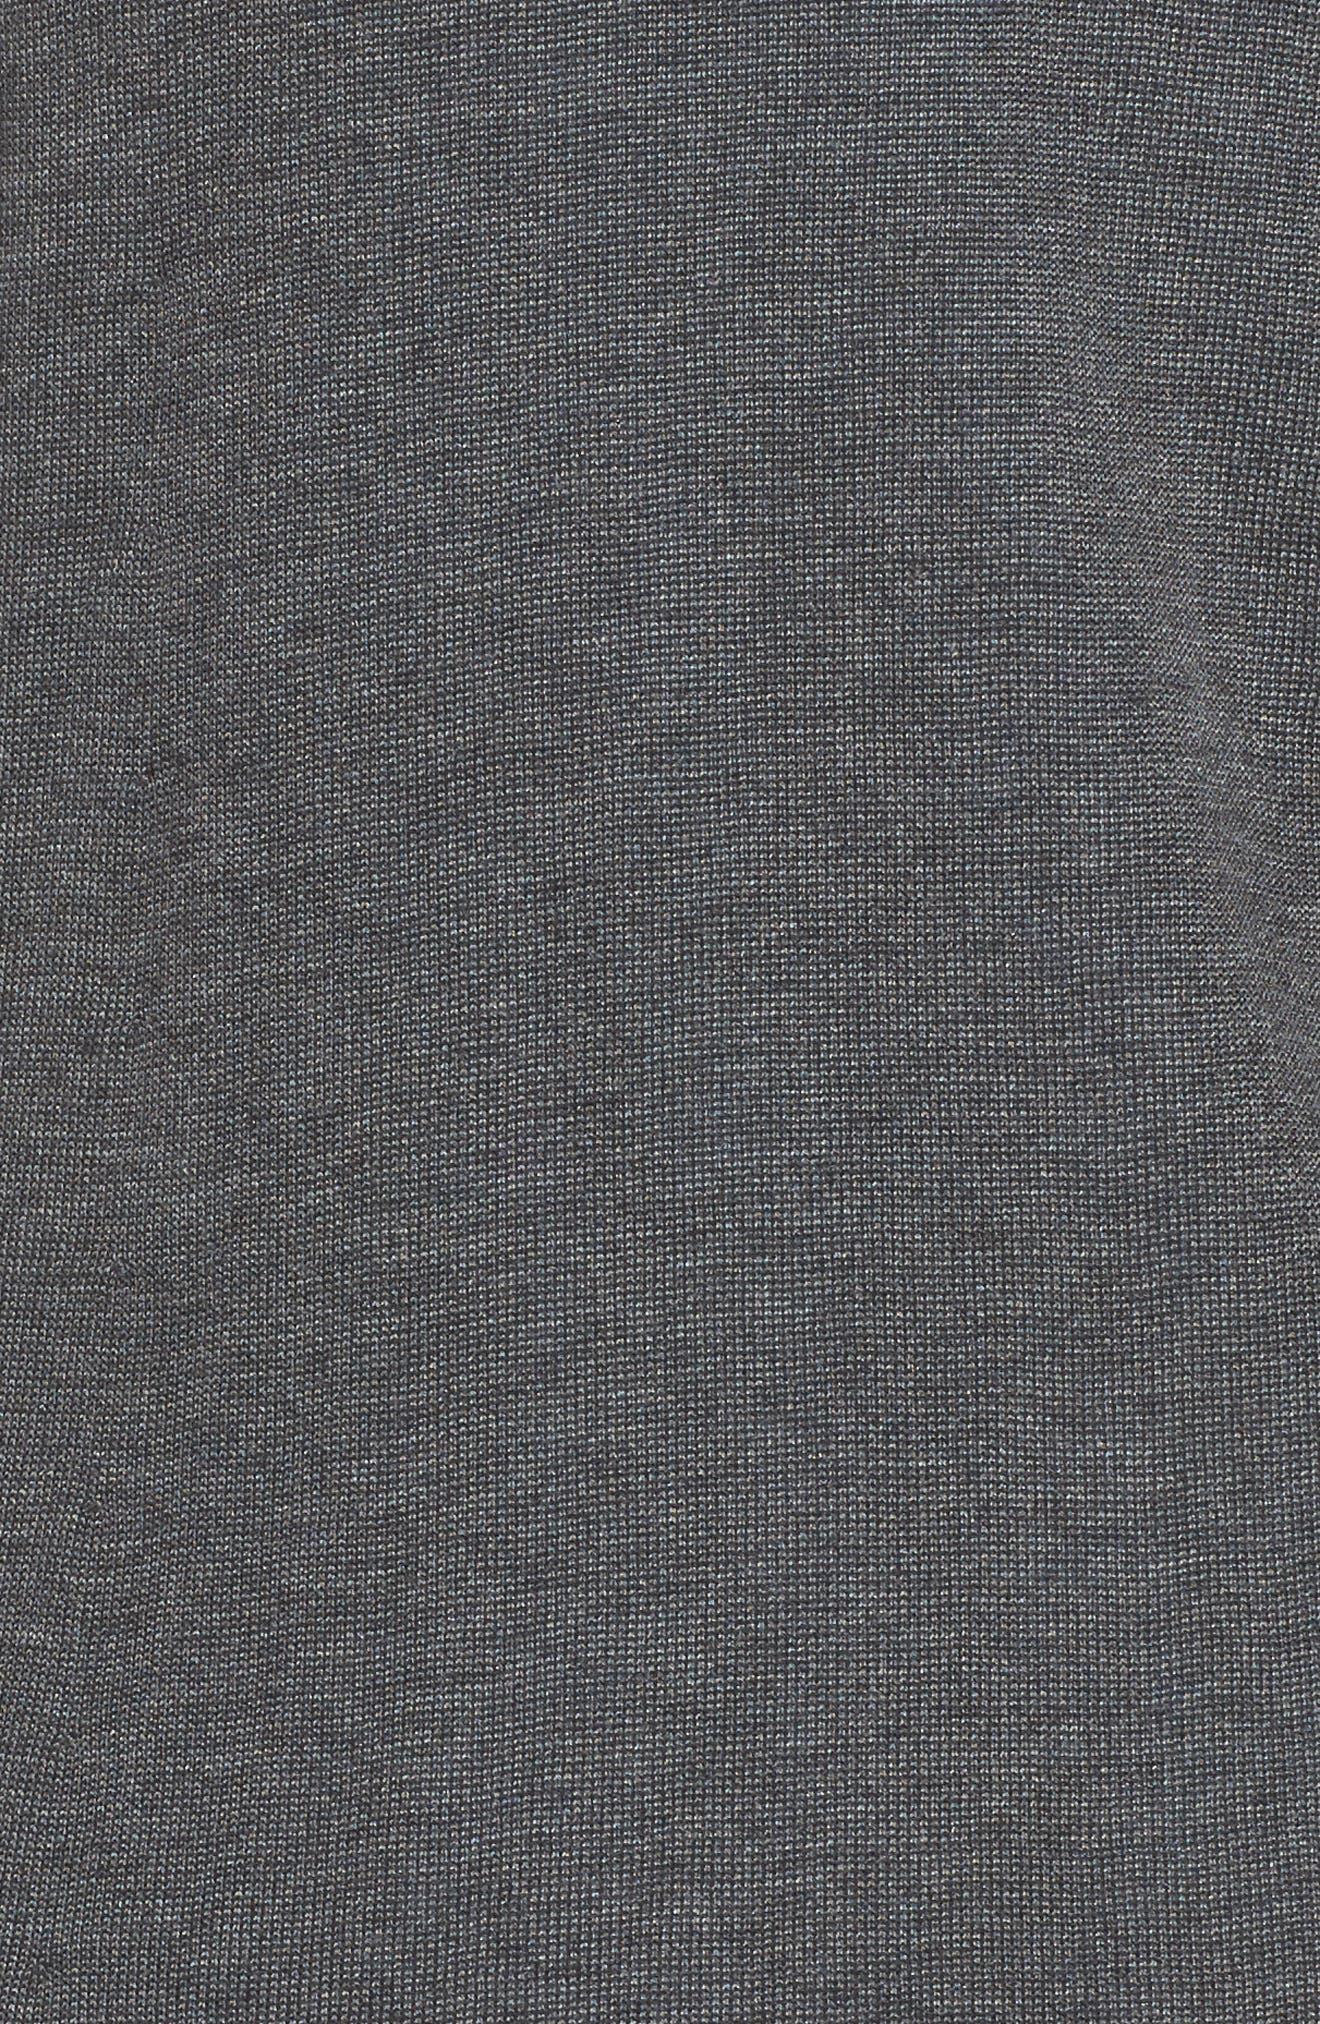 Alternate Image 5  - Eileen Fisher Slouchy Tencel® Blend Cardigan (Plus Size)